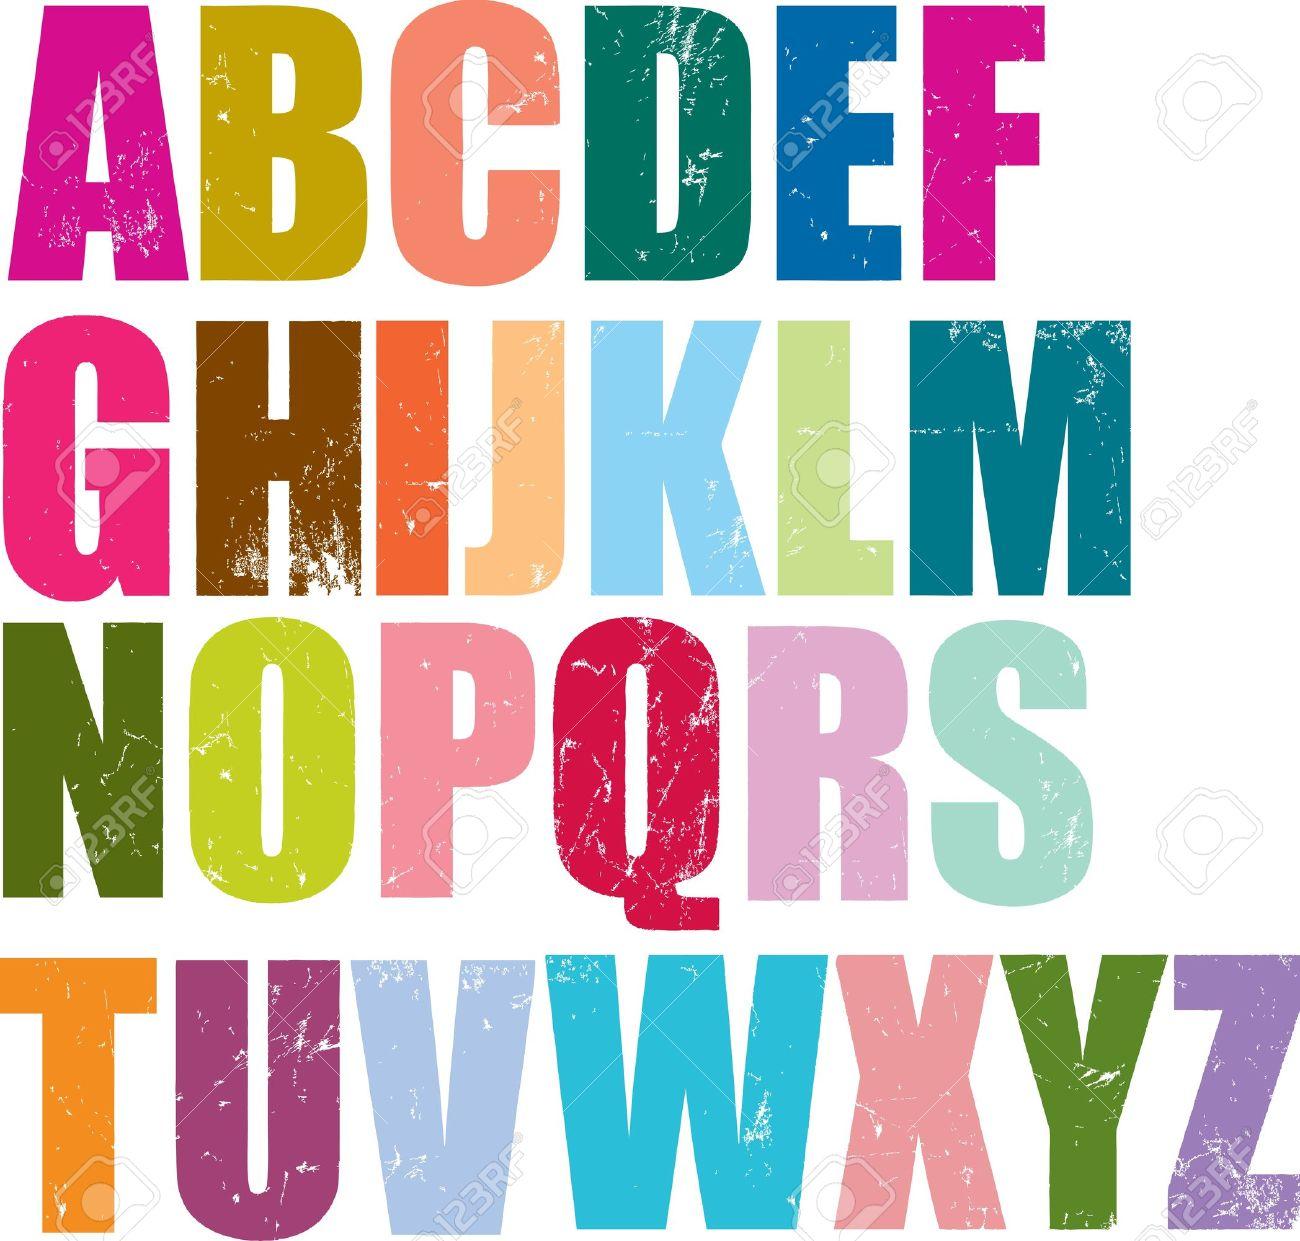 Worksheet Alphabets Letters individual letterpress letters of the whole english alphabet vector alphabet